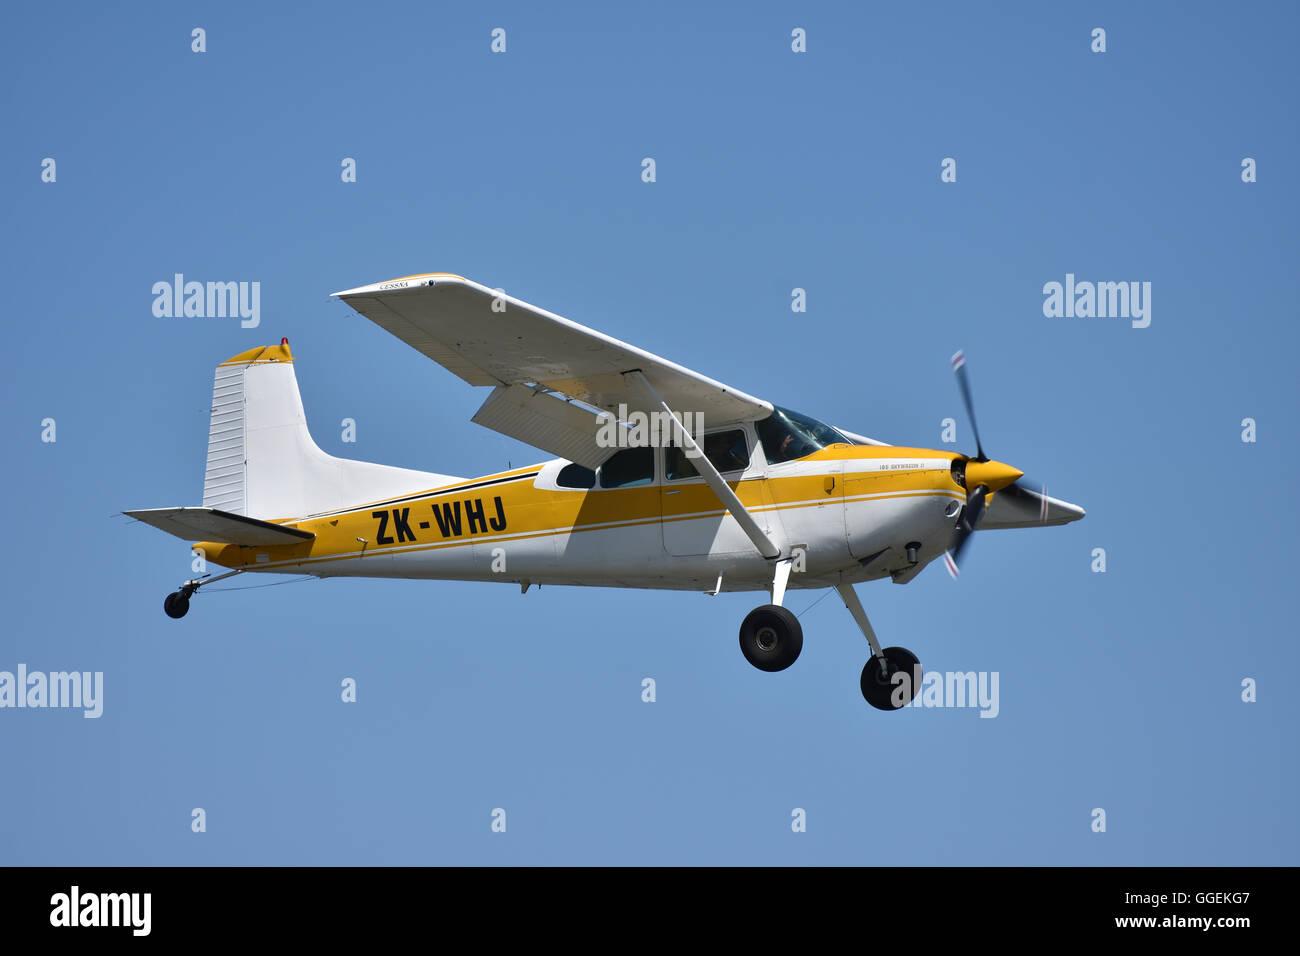 Cessna Skywagon airplane flying - Stock Image